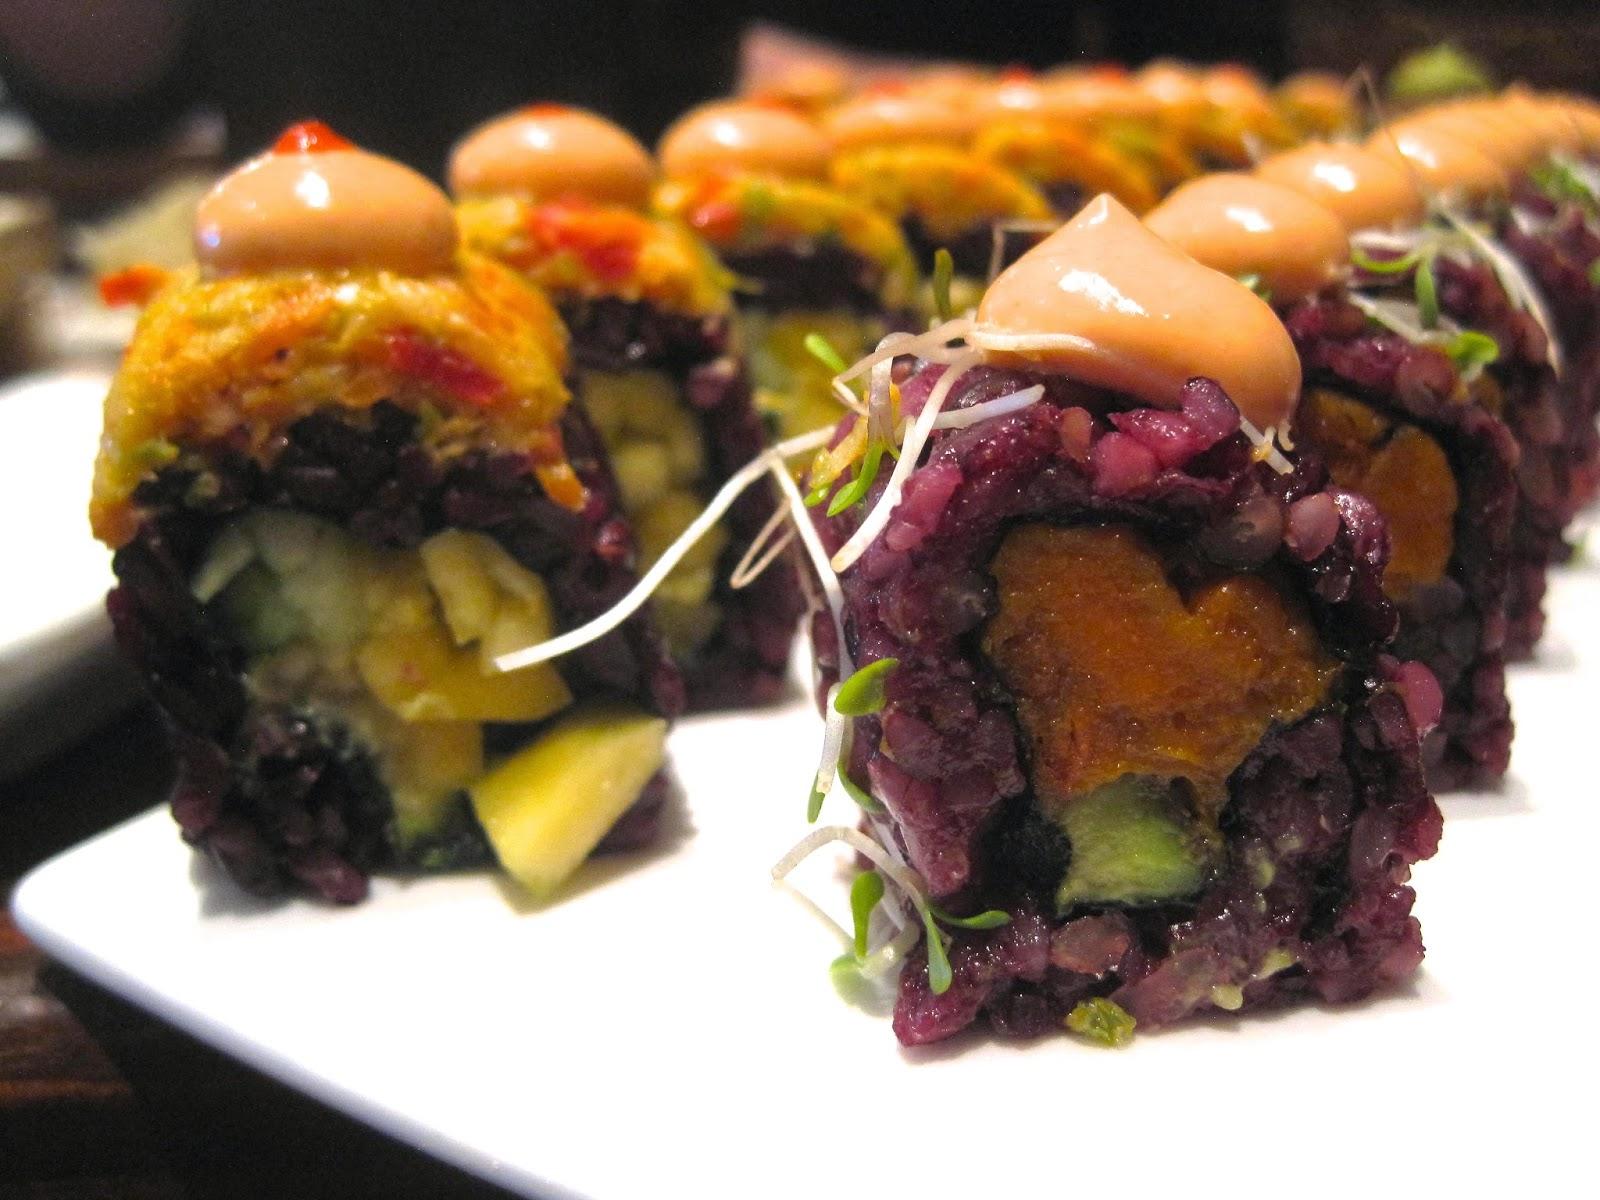 Spicy Mang & Sweet Tree Rolls - Beyond Sushi Vegan Blog Veega